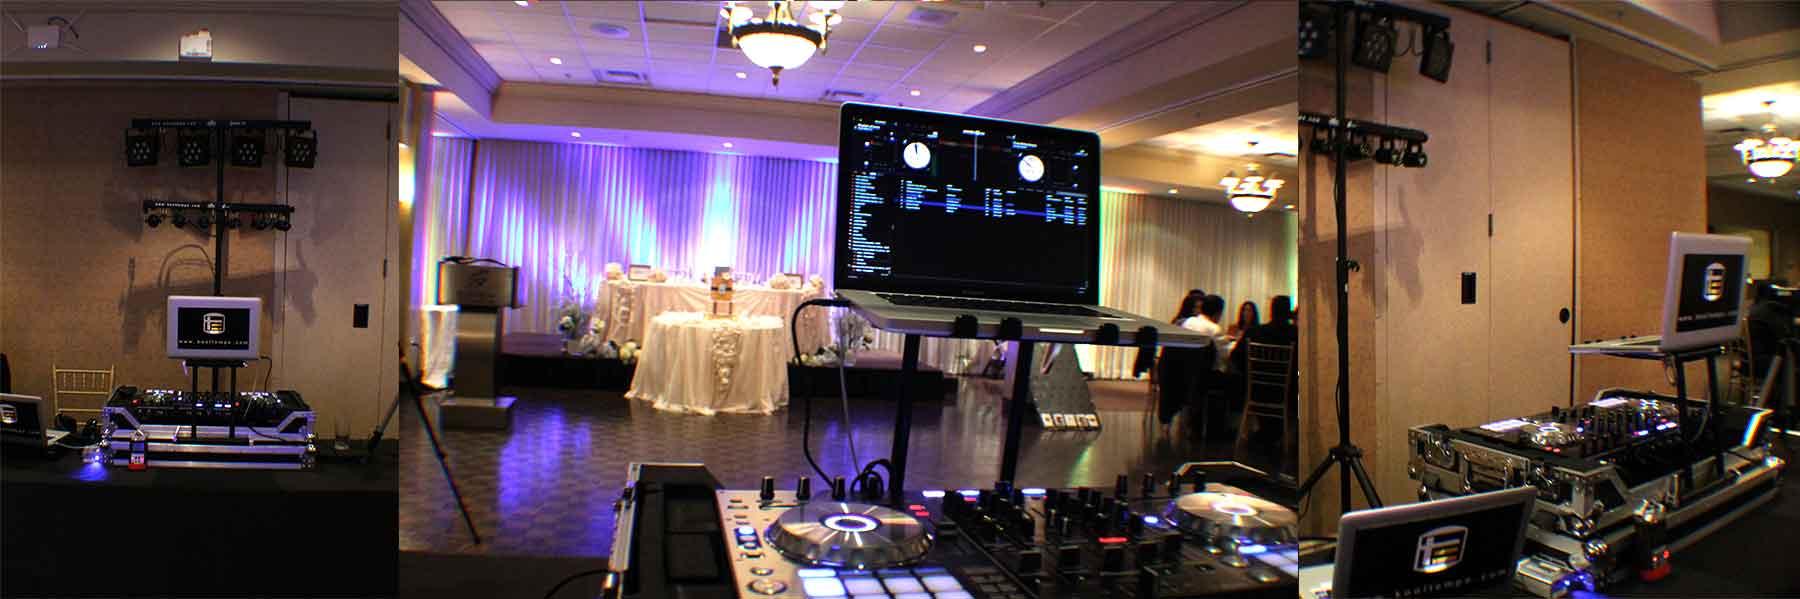 Wedding-DJ-Set-up-&-Uplighting-at-Bayview-Golf-&-Country-Club-Toronto